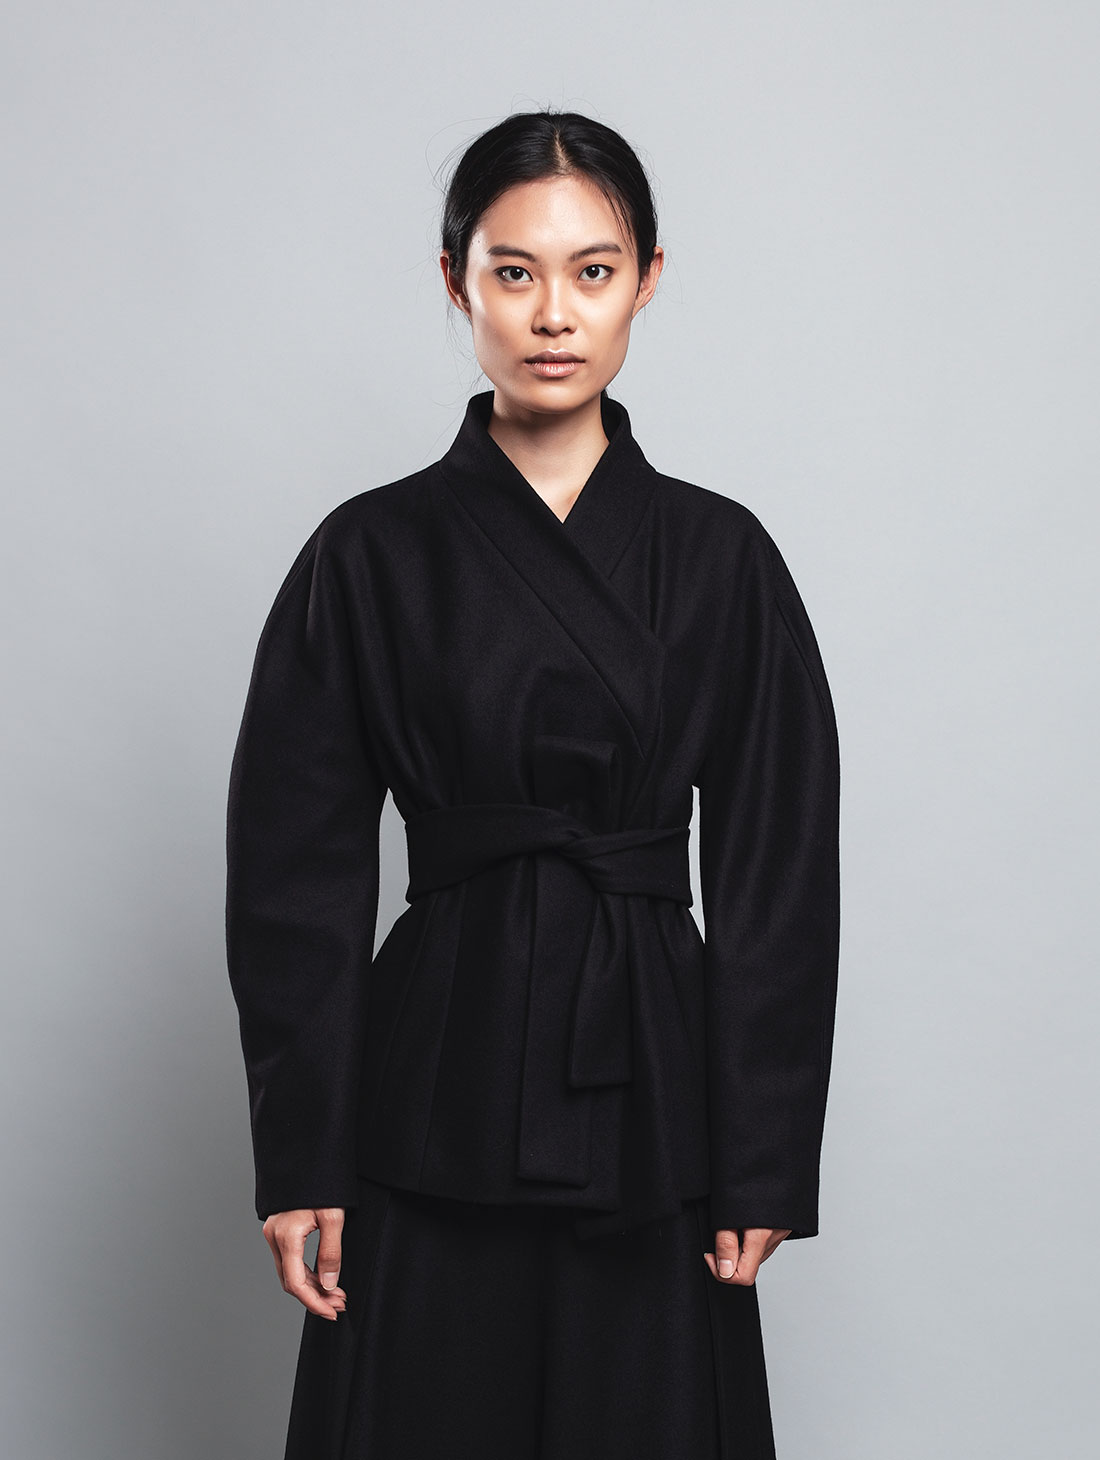 Draxis – Giacca a Kimono Nera, 100% Lana